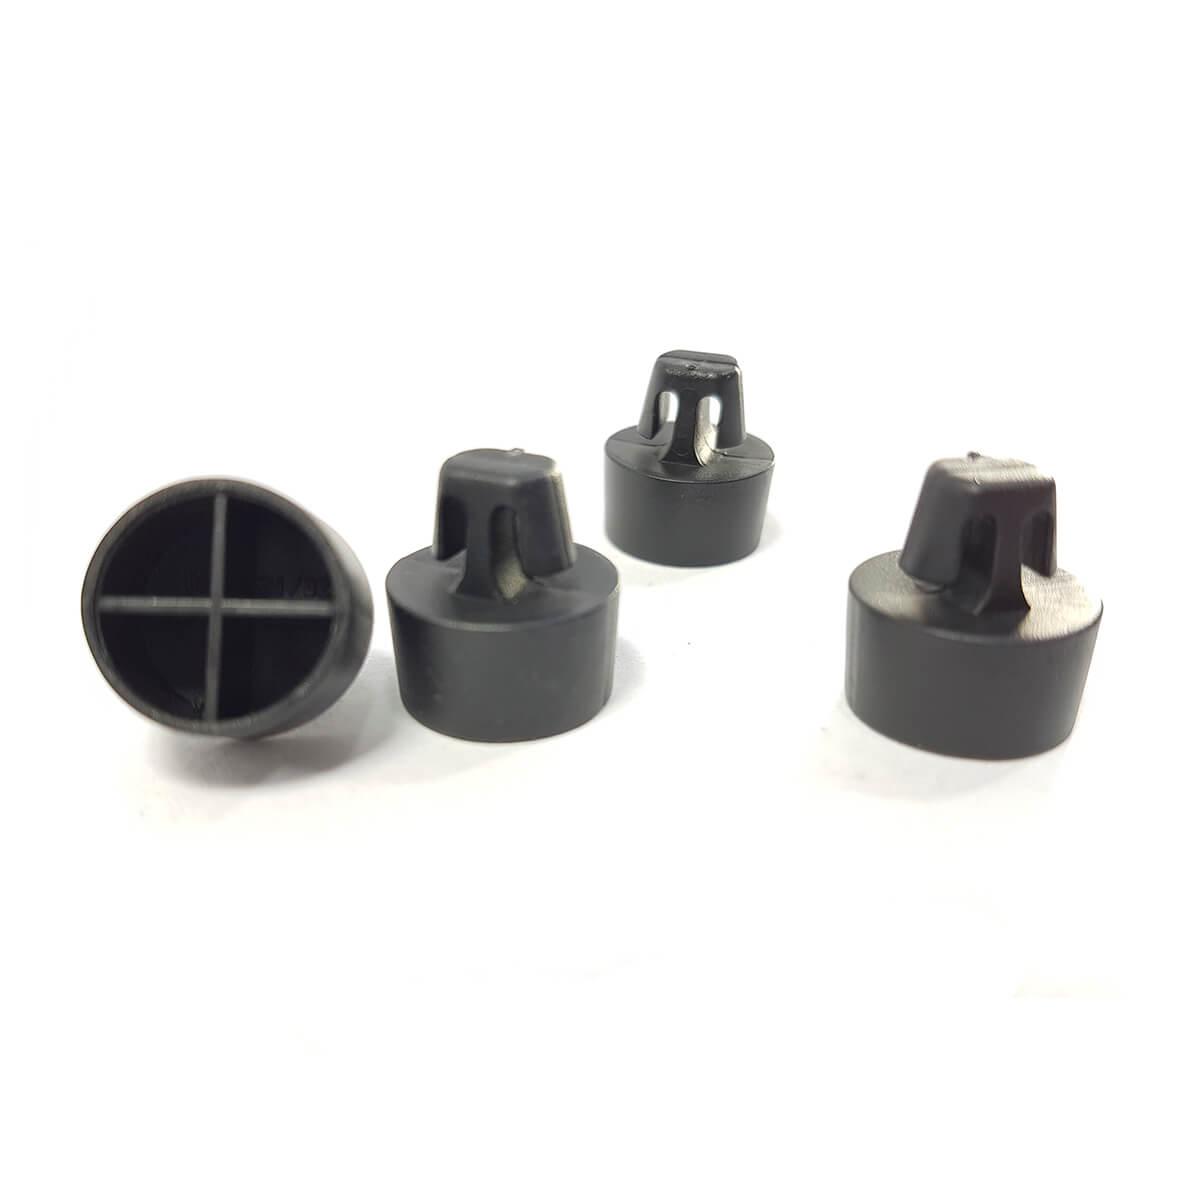 Kit 4 Unidades Do Pé Encaixe Microondas Electrolux - 67492890